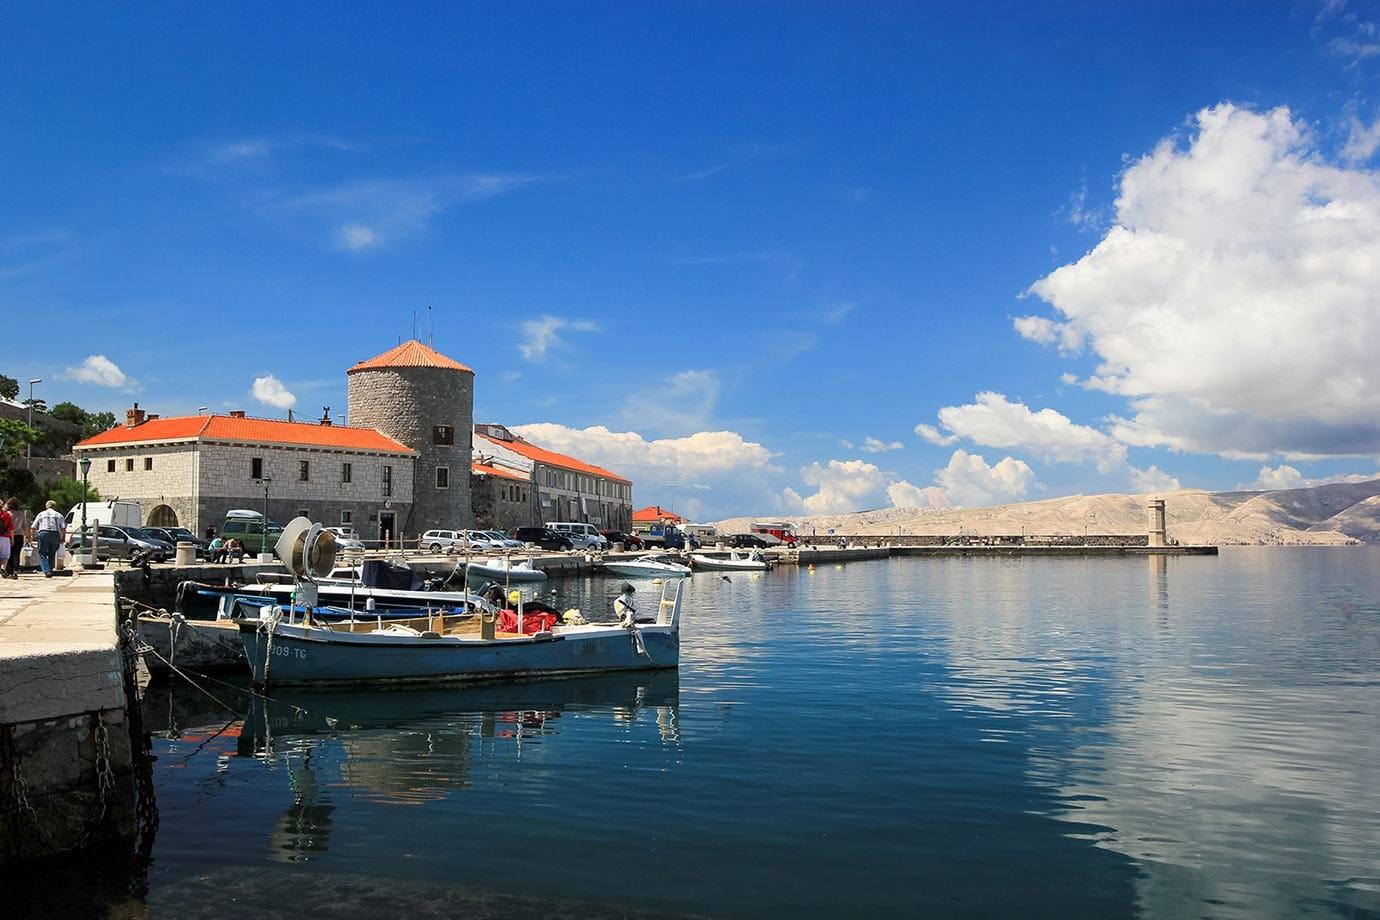 Boats in Croatia